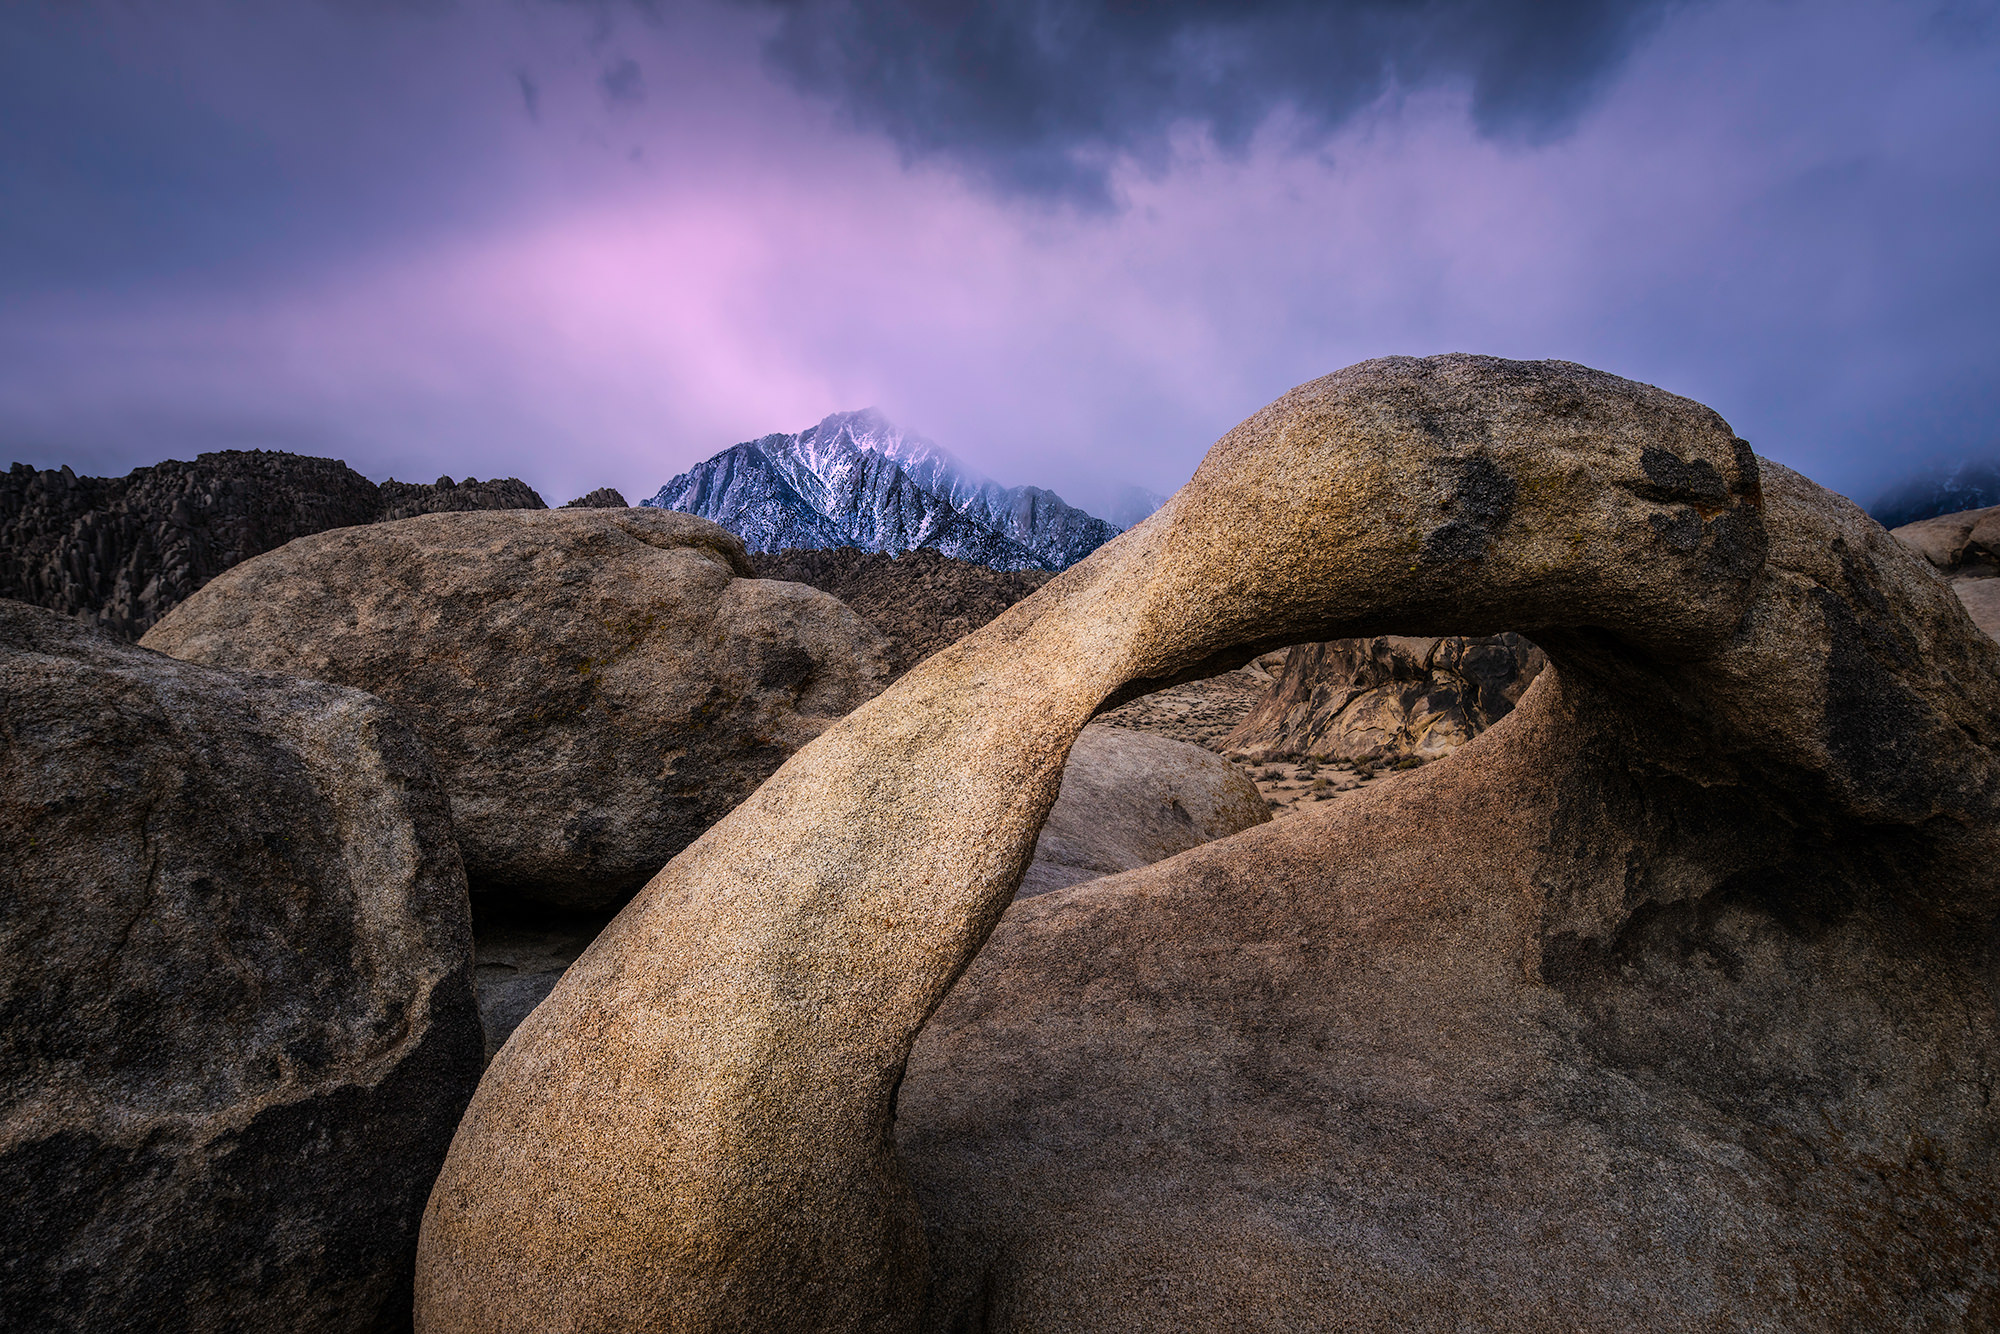 MOBIUS ARCH - Alabama Hills - Lone Pine, CA